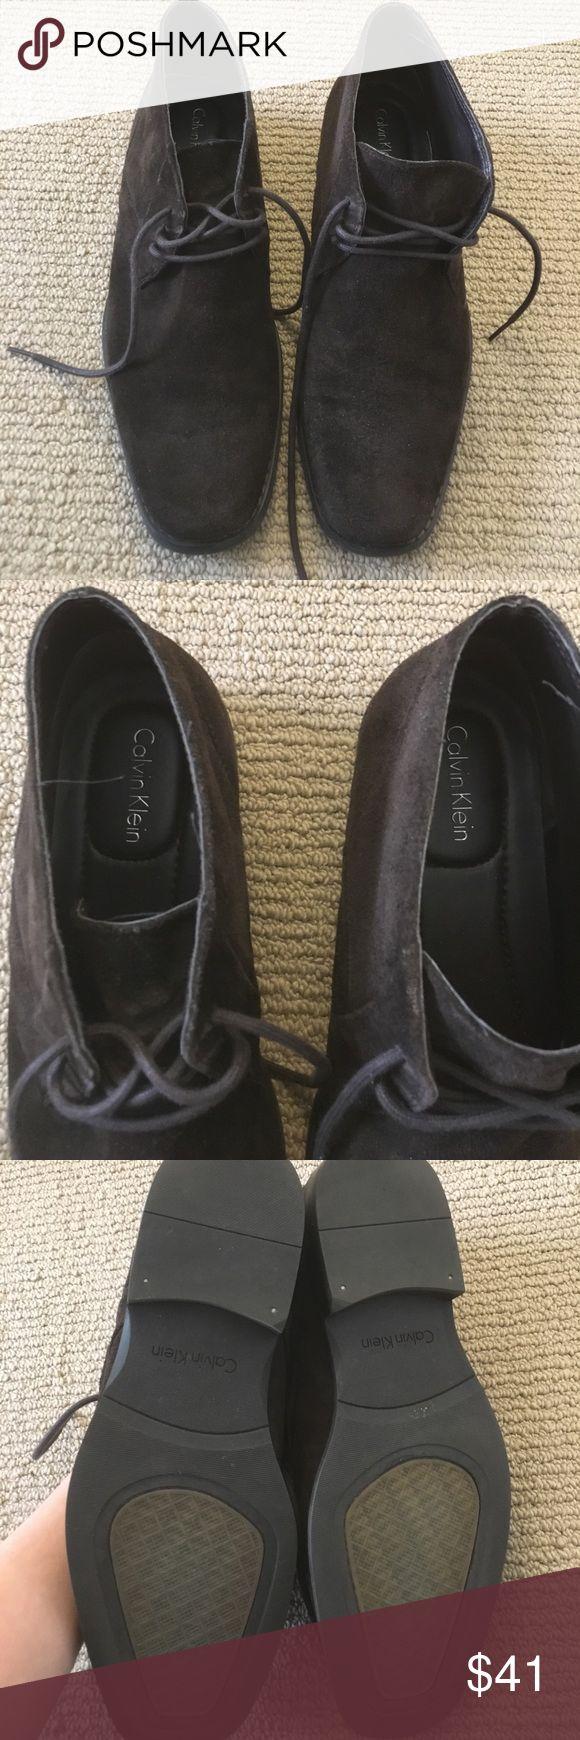 MEN'S Calvin Klein brown suede shoes Beautiful MEN'S Calvin Klein brown suede shoes in great condition. Calvin Klein Shoes Chukka Boots